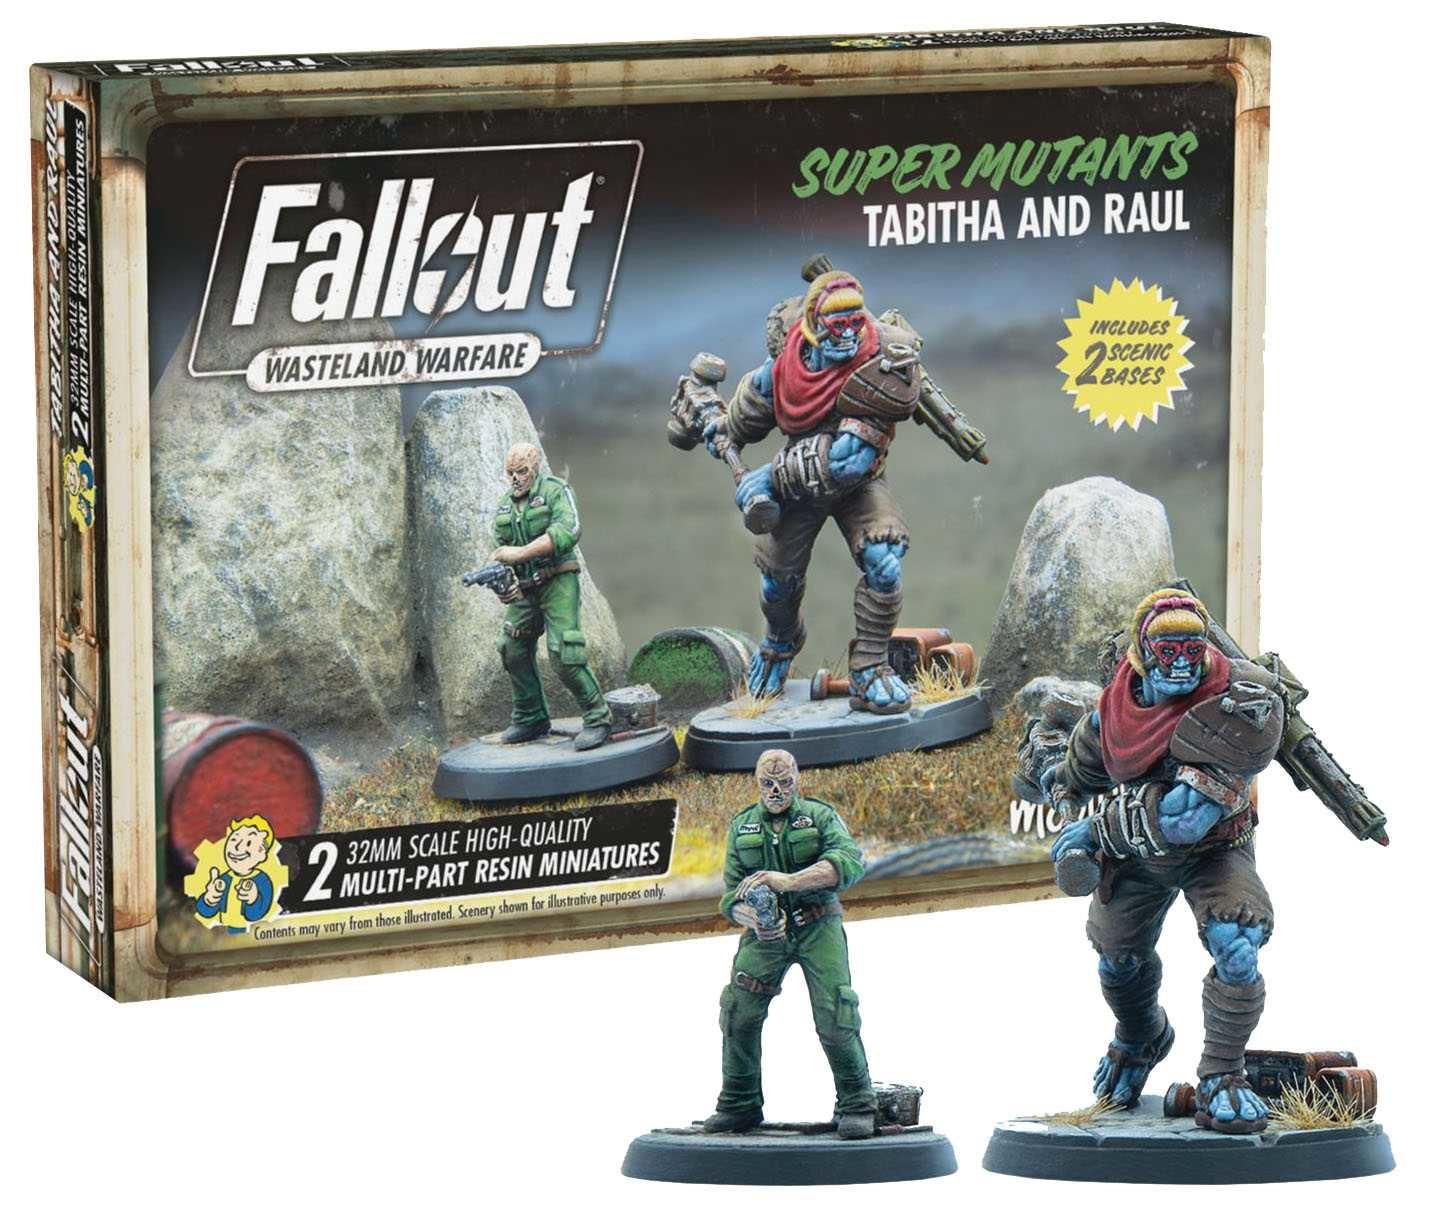 Modiphius Fallout Wasteland Warfare: Super Mutants Tabitha and Raul